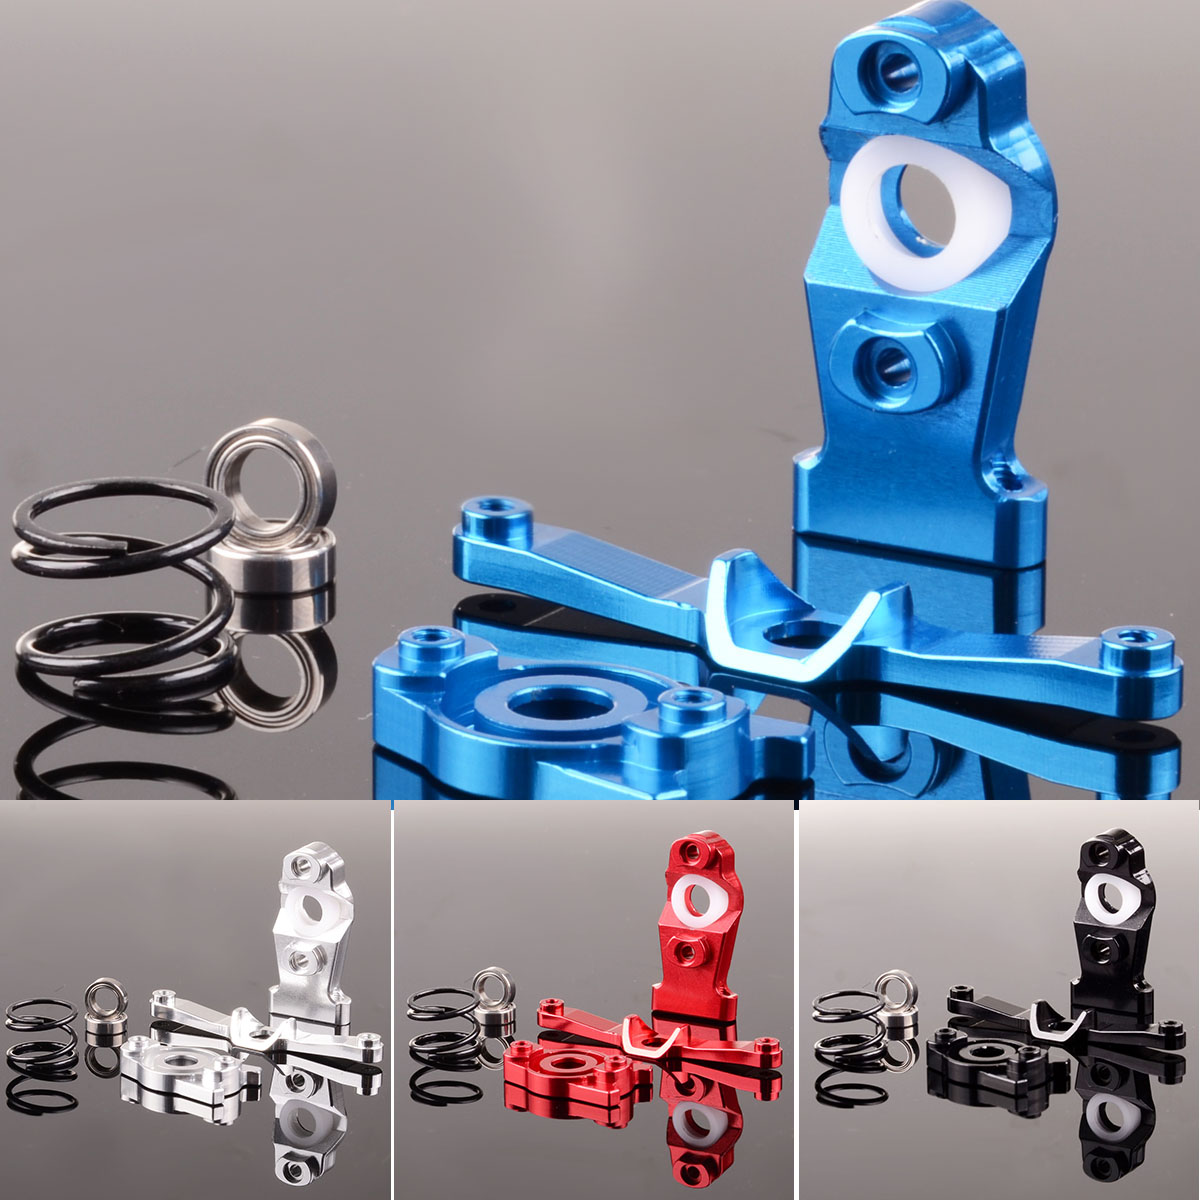 aluminum steering assembly erv048 for rc gpm traxxas 1 16 e revo slash summit 1 16 [ 1200 x 1200 Pixel ]